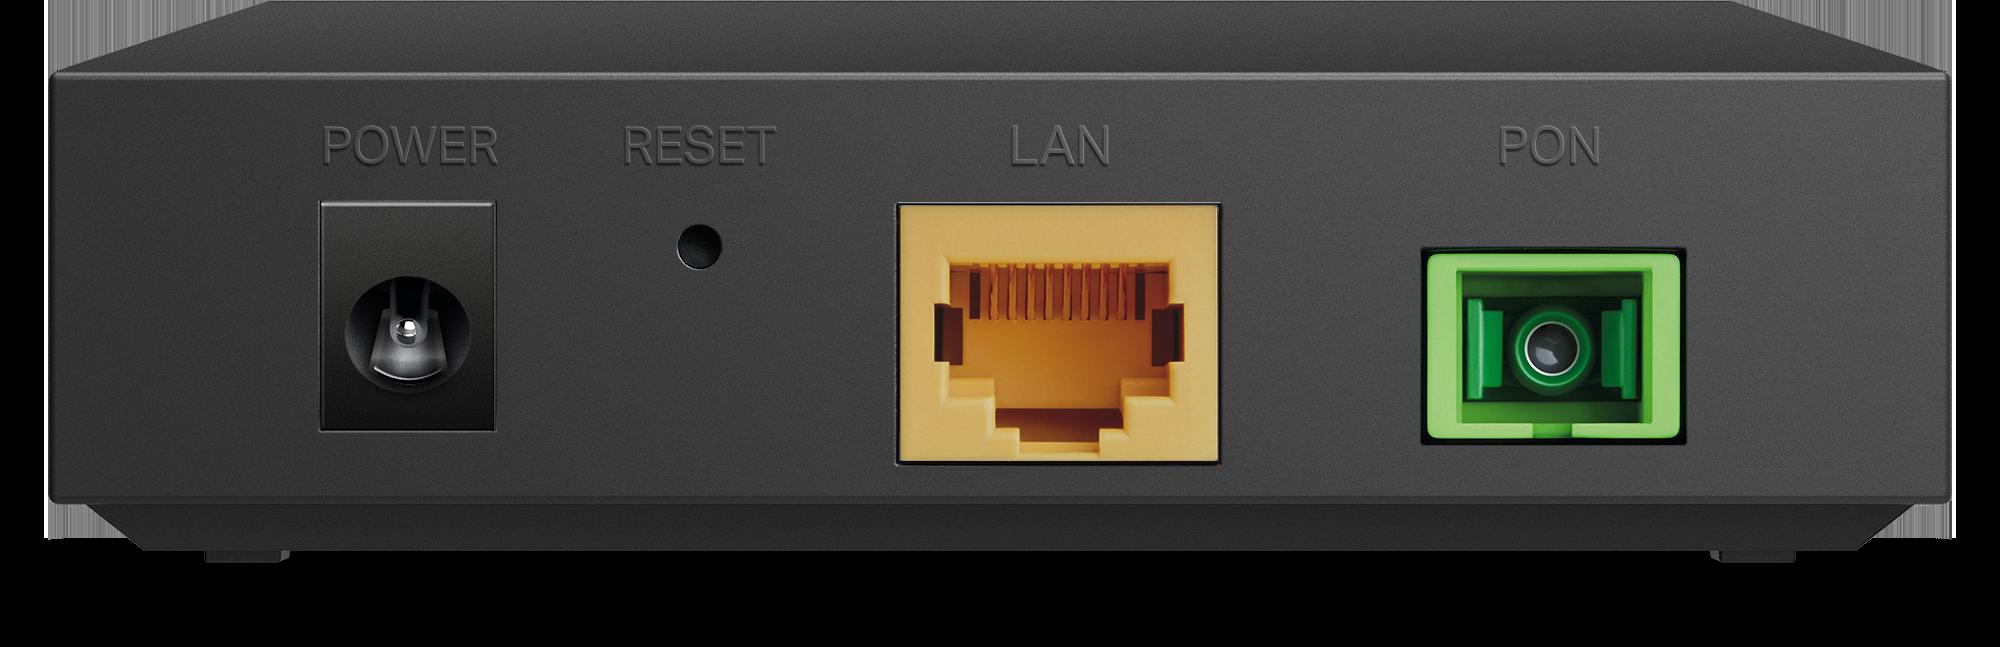 Modem Tp-Link XZ000-G3 Gigabit Gpon Fibra Optica